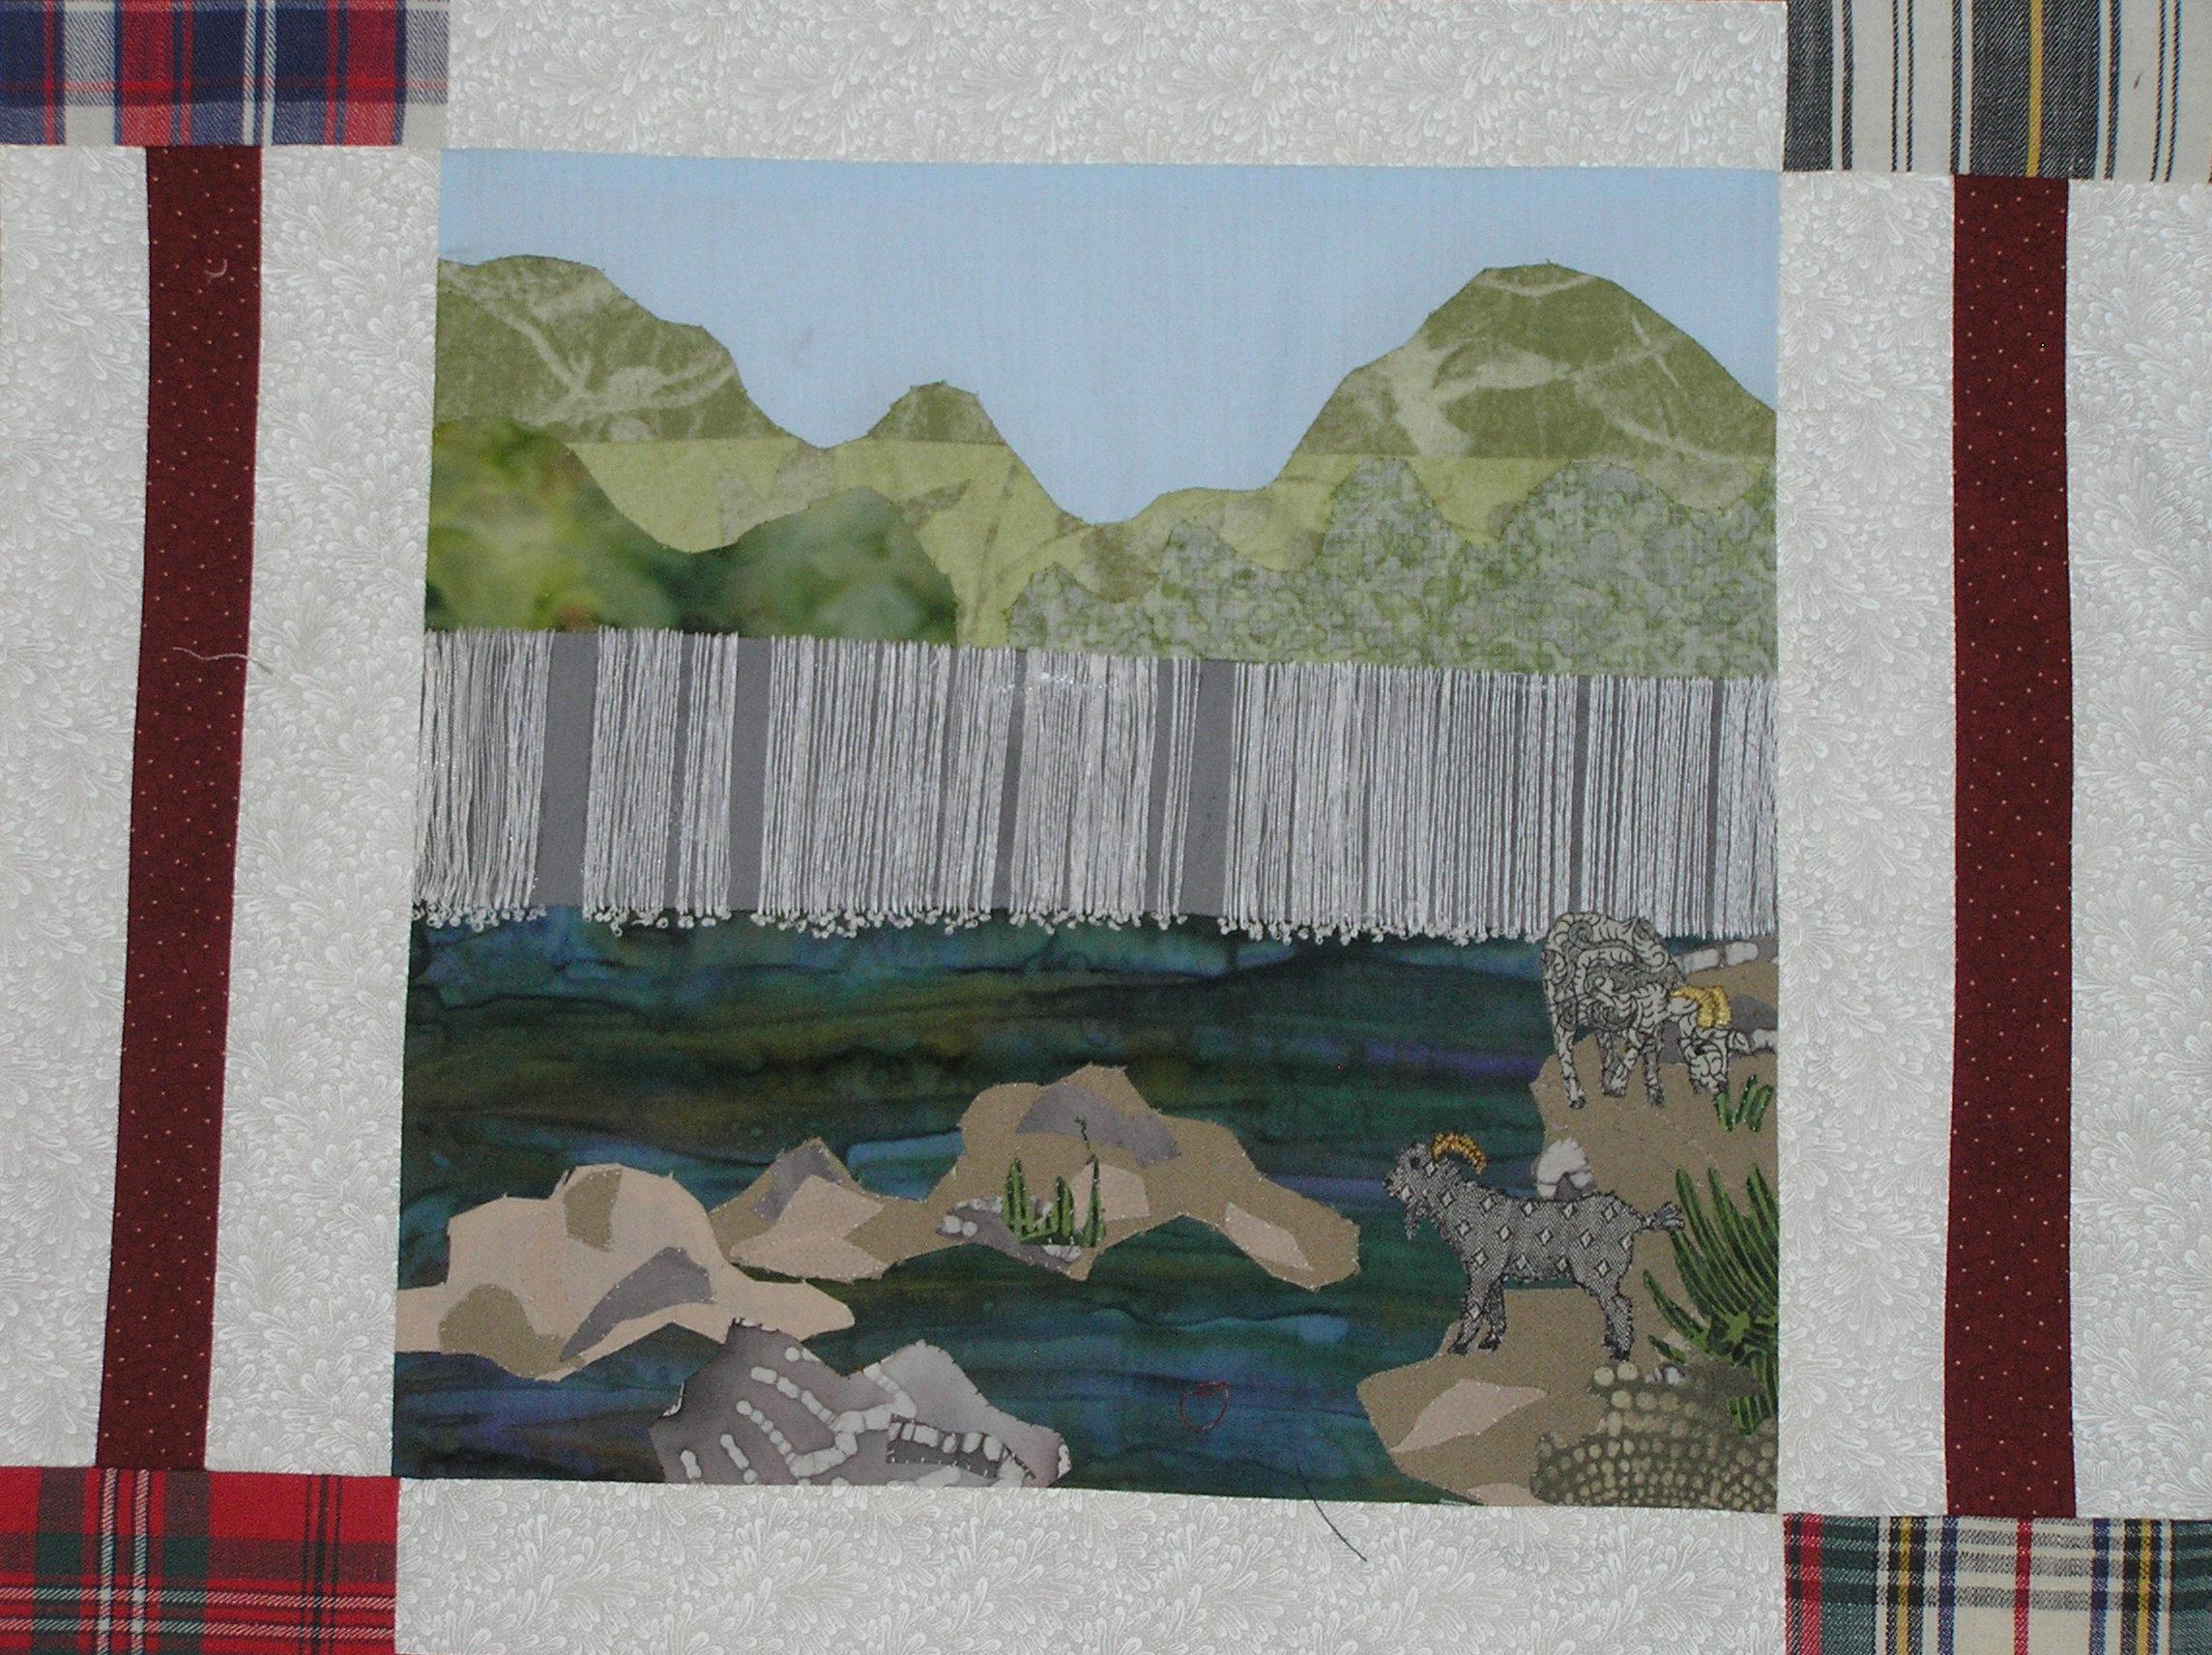 Glencoe Dam